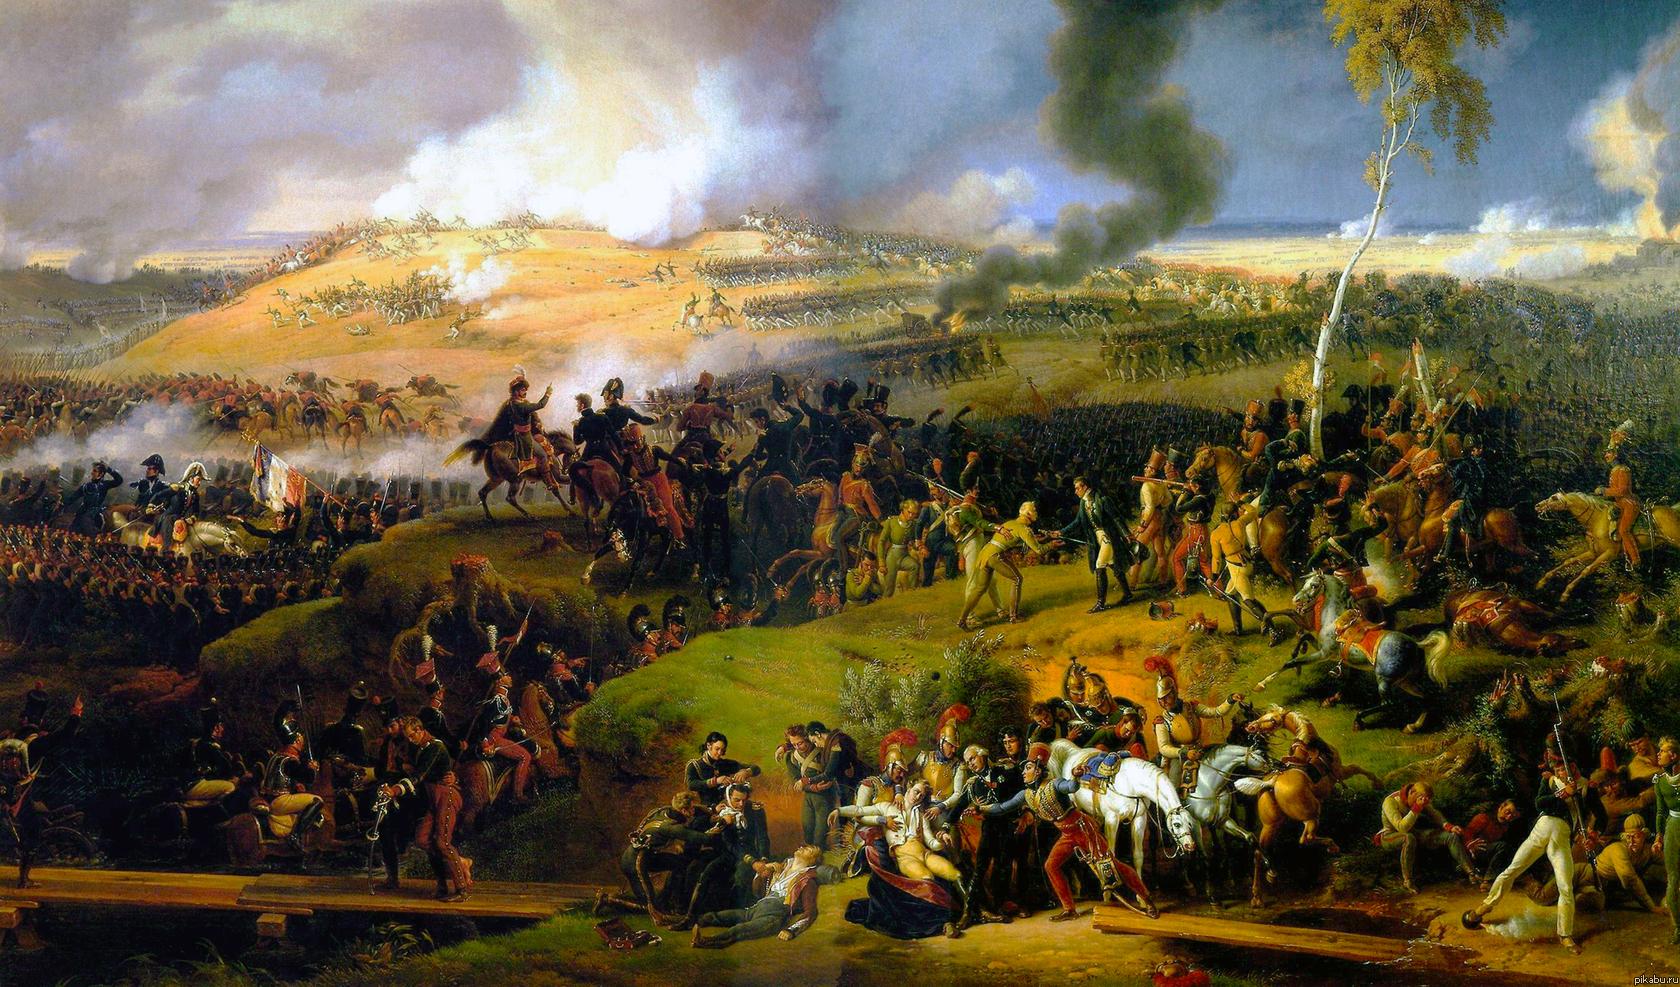 Бородинское сражение ровно 200 лет ...: pikabu.ru/story/borodinskoe_srazhenie_676078